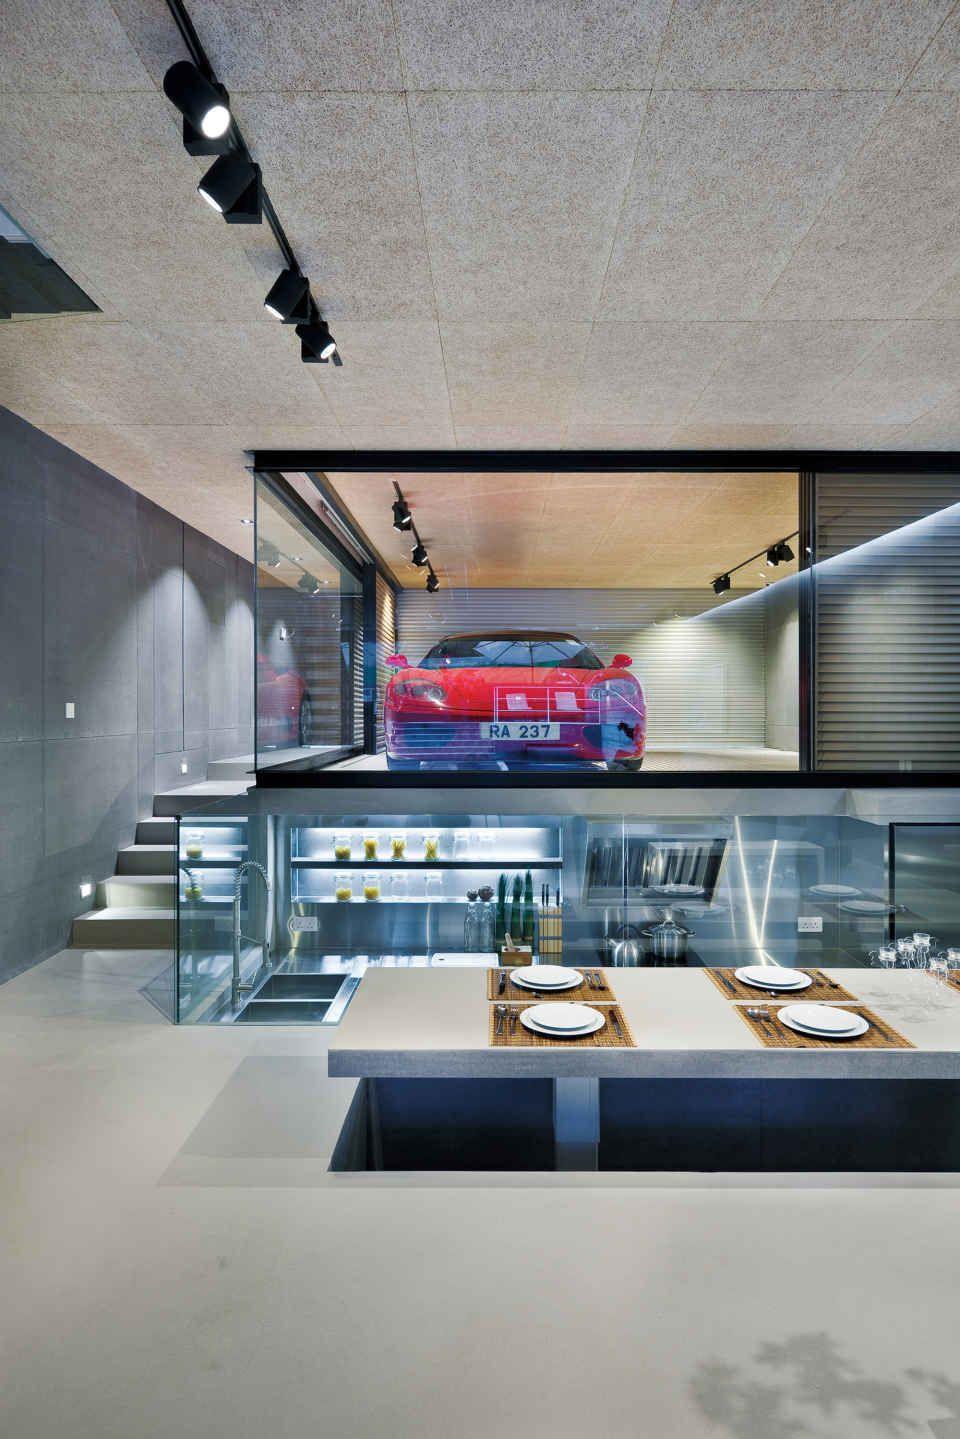 22 Luxurious Garages Perfect For A Supercar Garage Design Garage Interior Modern House Design